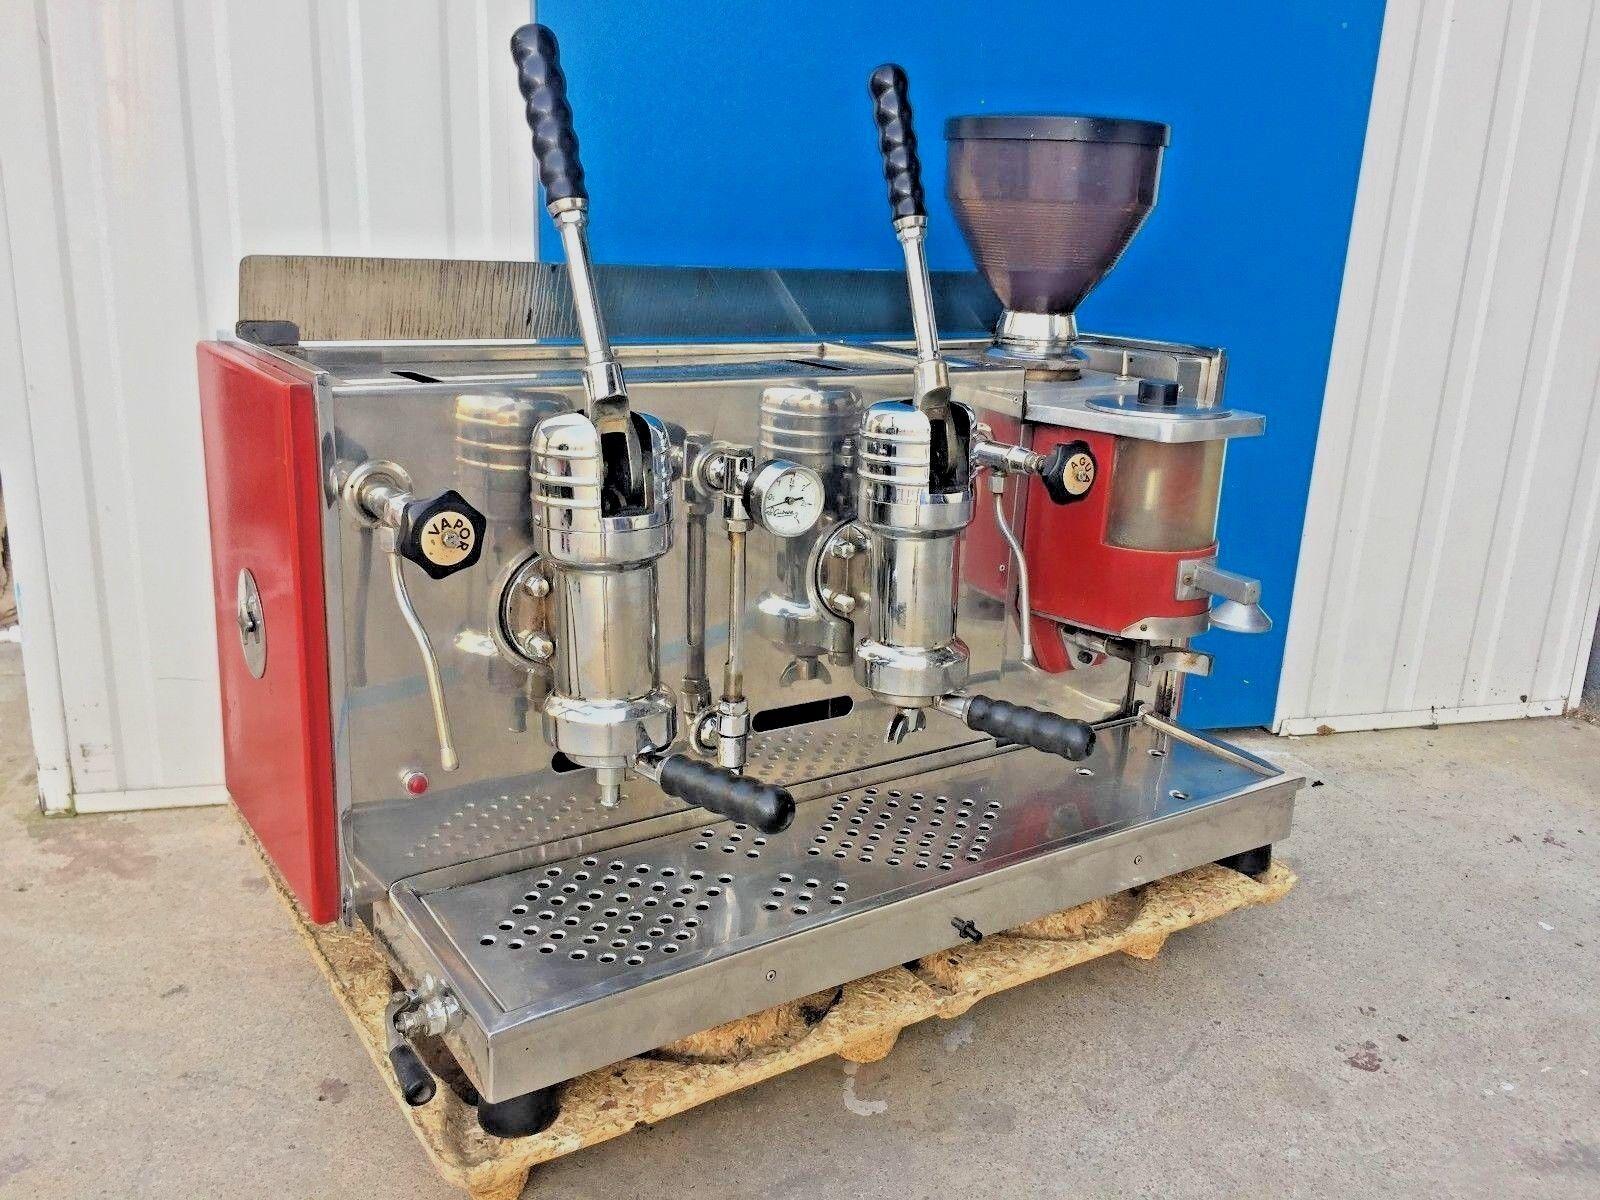 RARE VINTAGE Ferrure Lever Café Moulin coffee grinder moulin